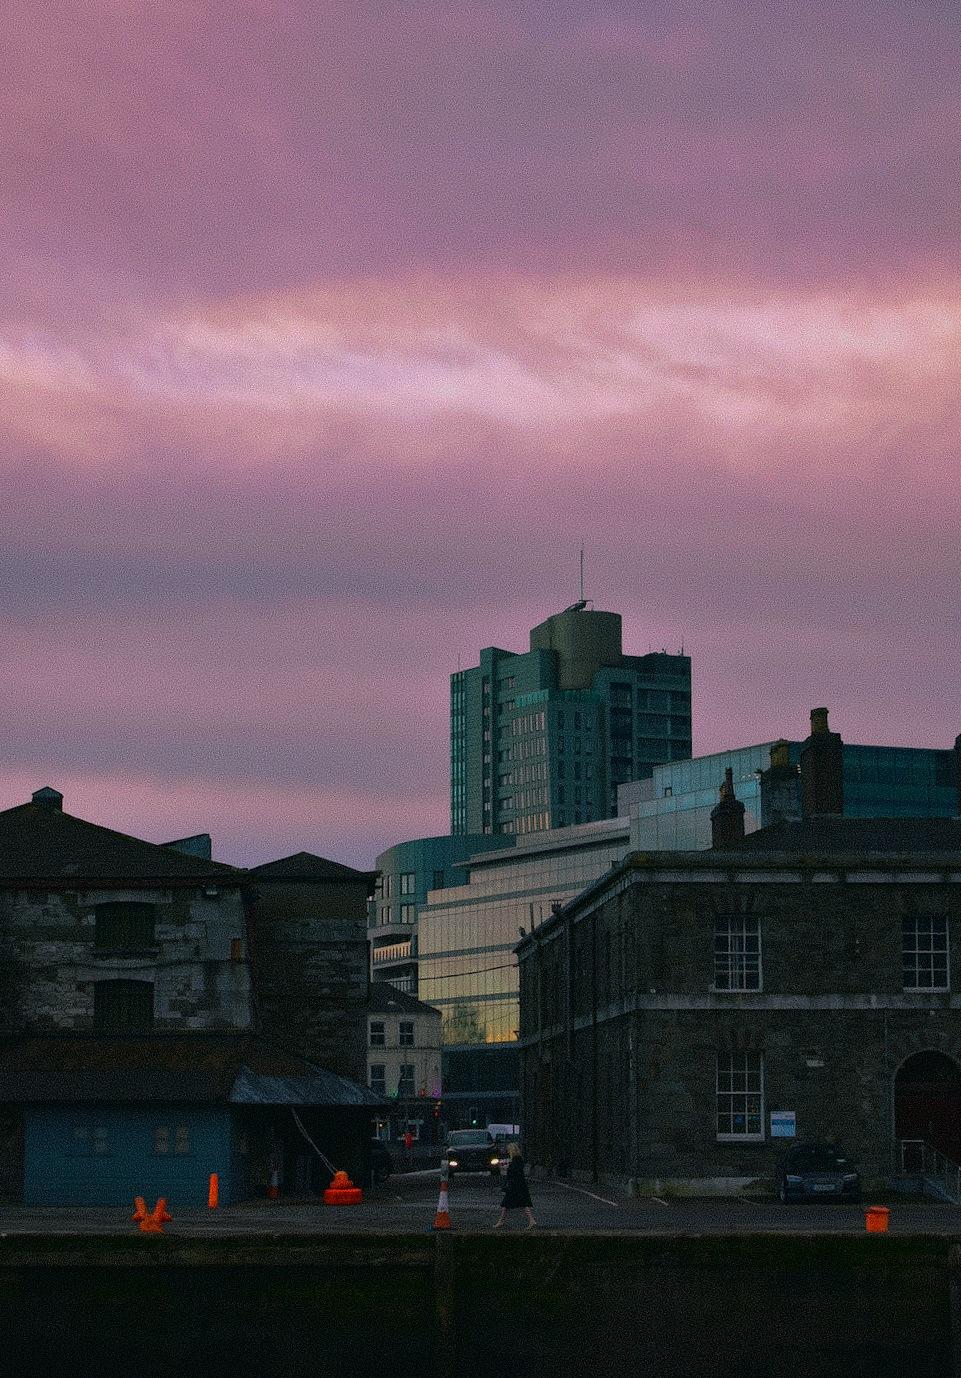 The Docks by Maeve Palmer